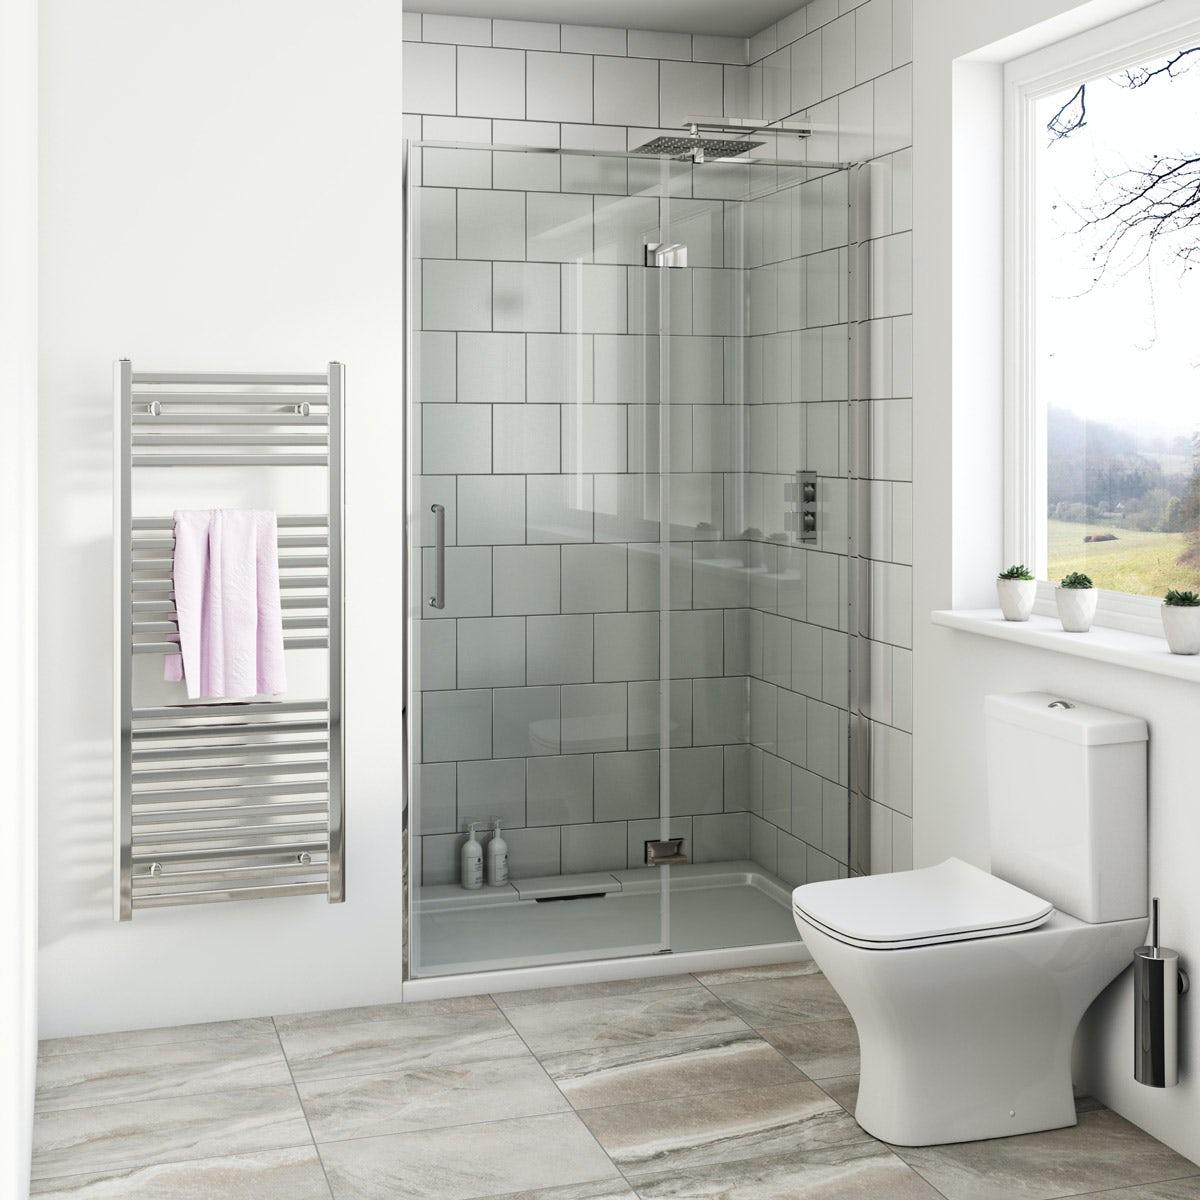 Mode Austin Premium 8mm Hinged Easy Clean Shower Door 900mm